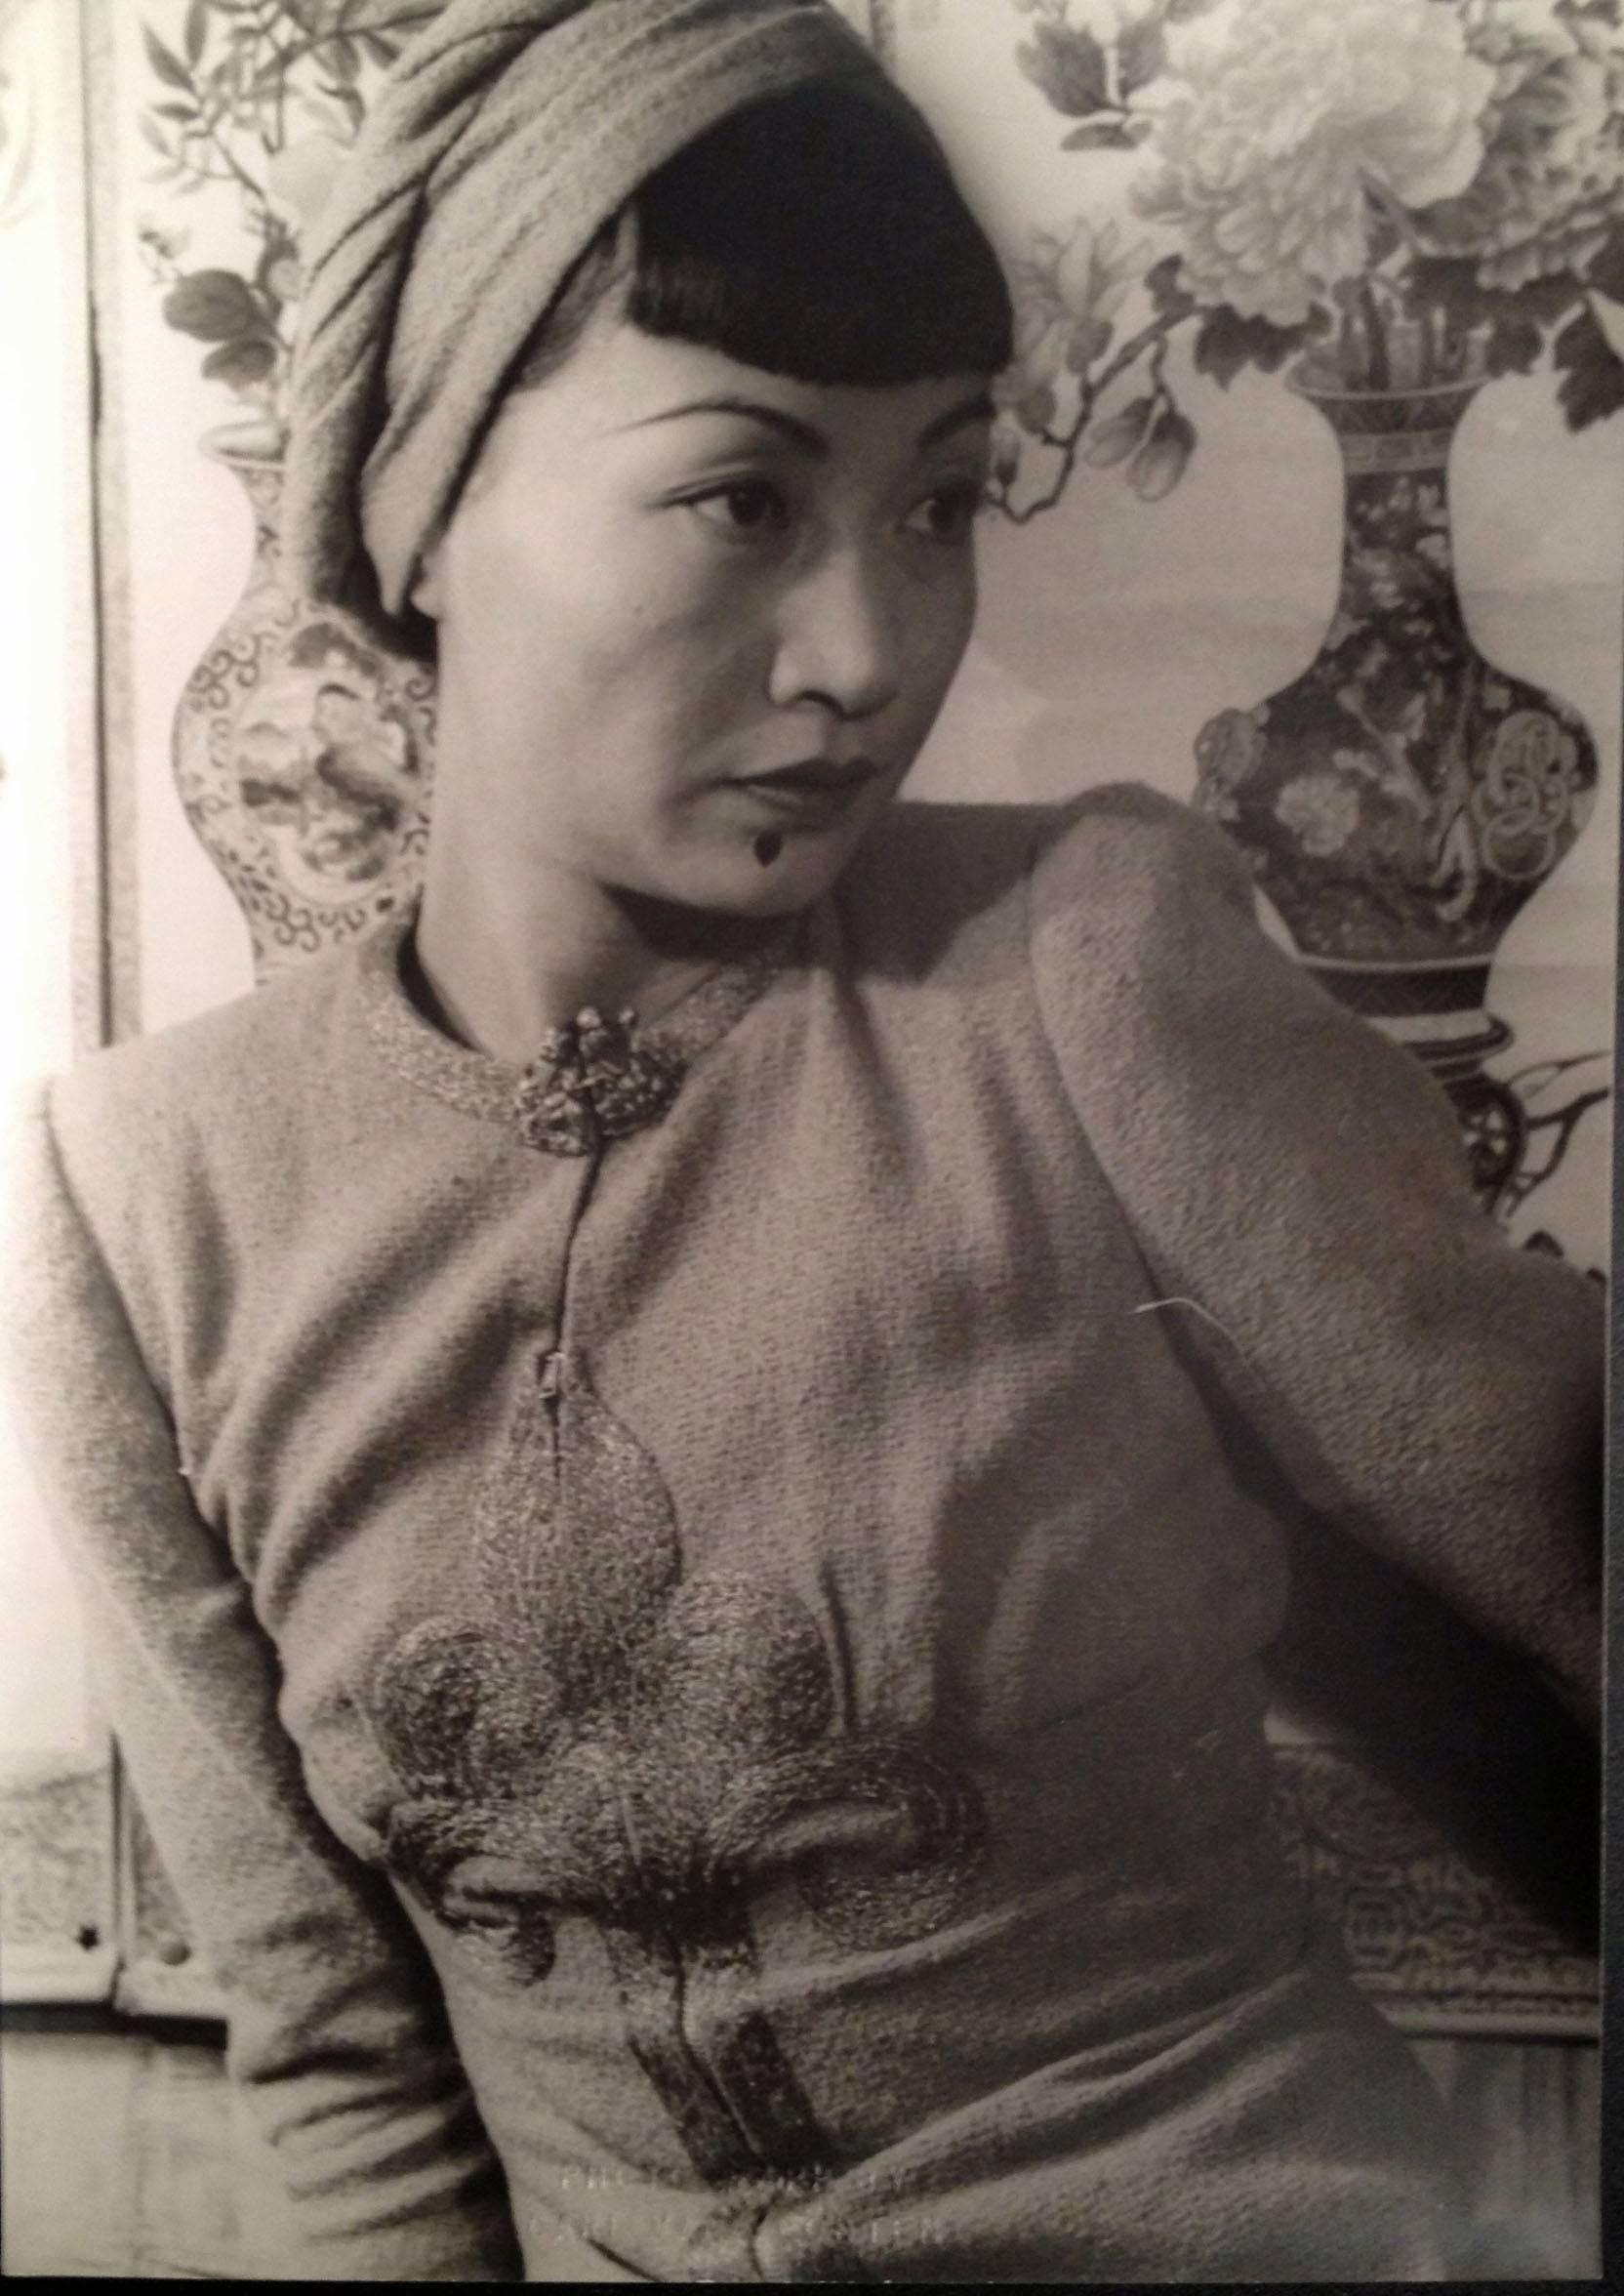 Communication on this topic: Haruka Ayase (b. 1985 F-cup[2 bakunyu, klaudia-kovacs-director/